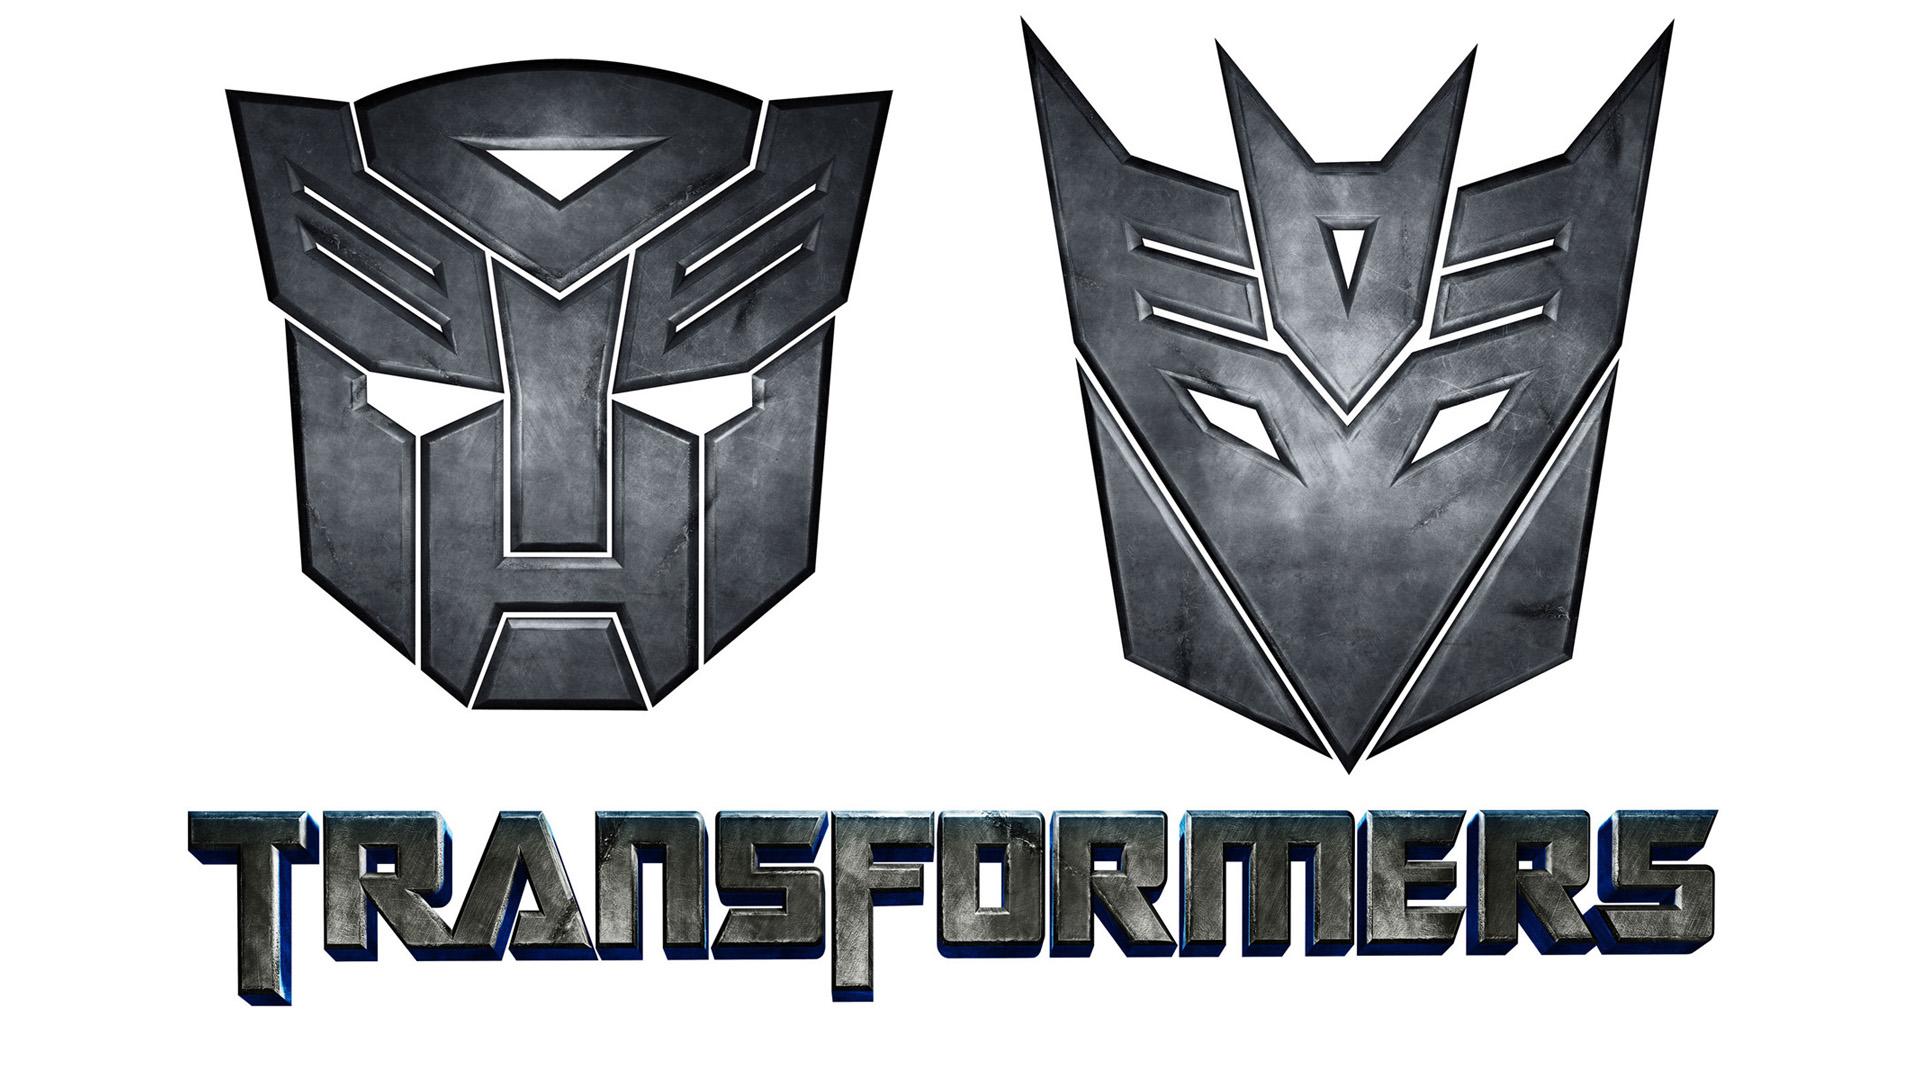 transformers, movie, wallpapers, wall, papers, 1920, 1080, pixels, revenge, fallen, widescreen